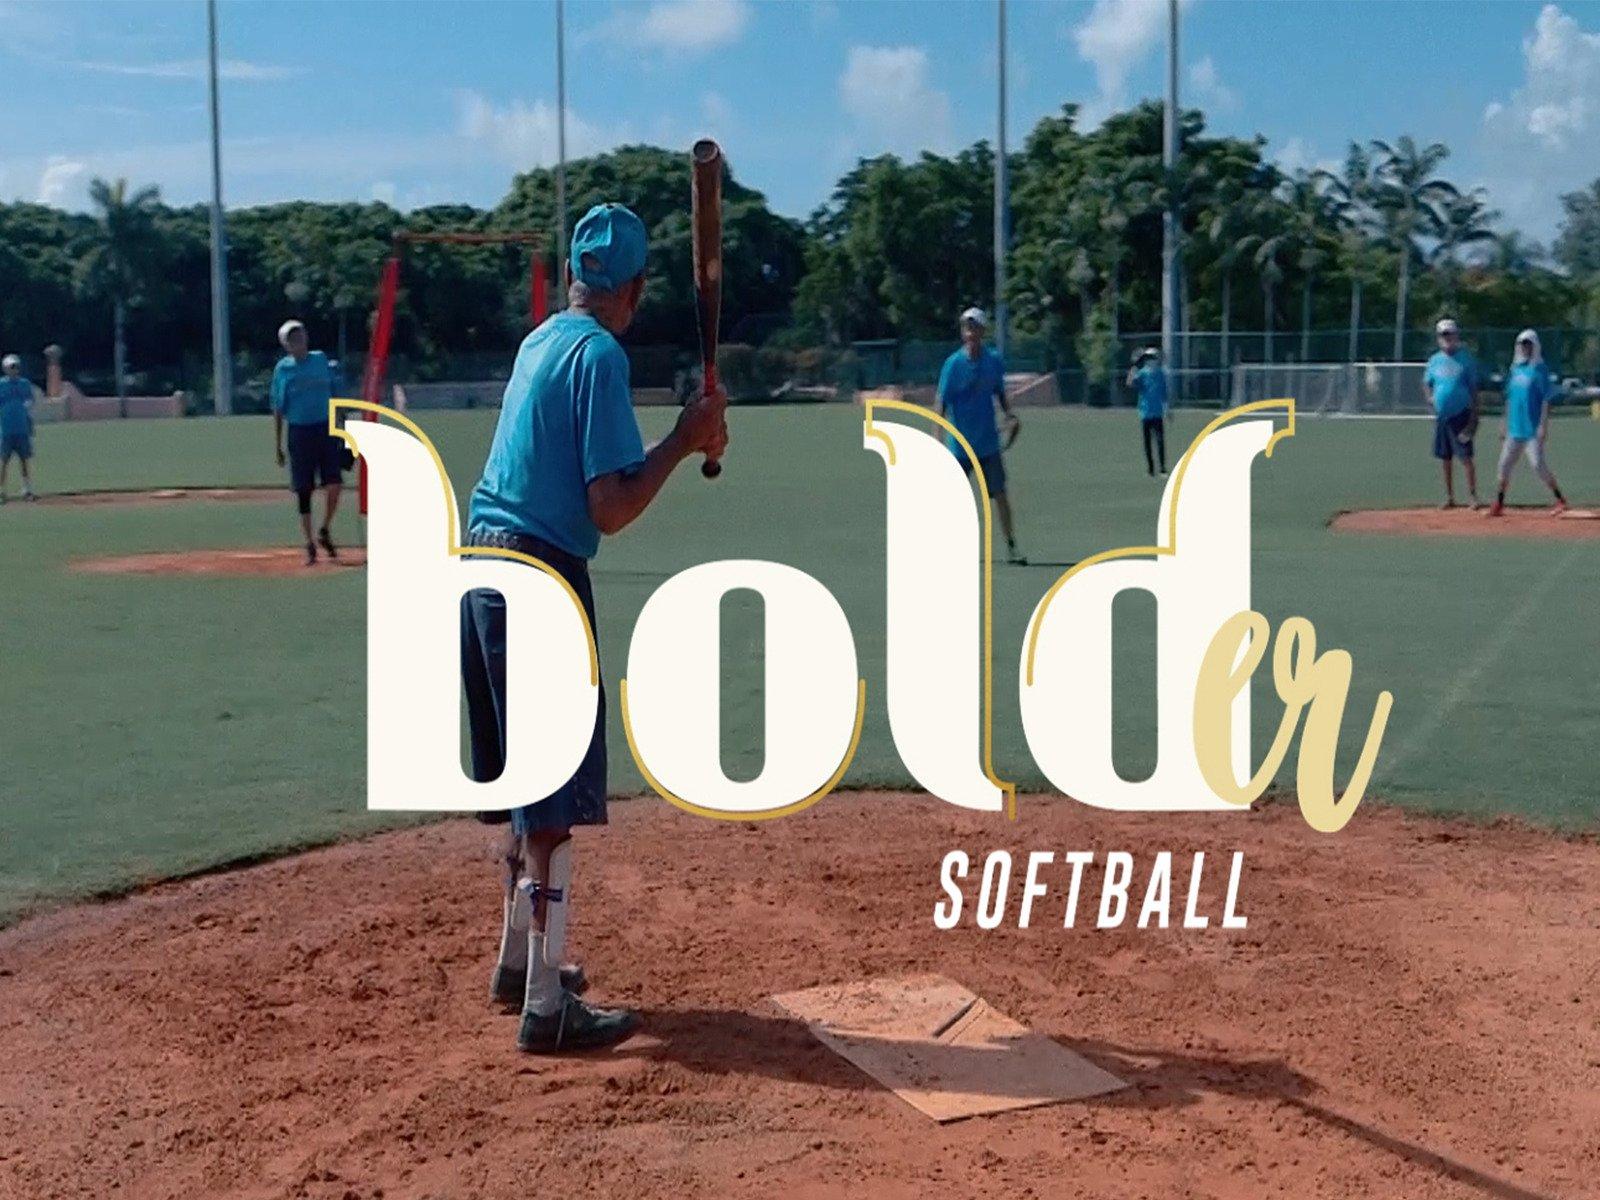 Bolder - Season 1